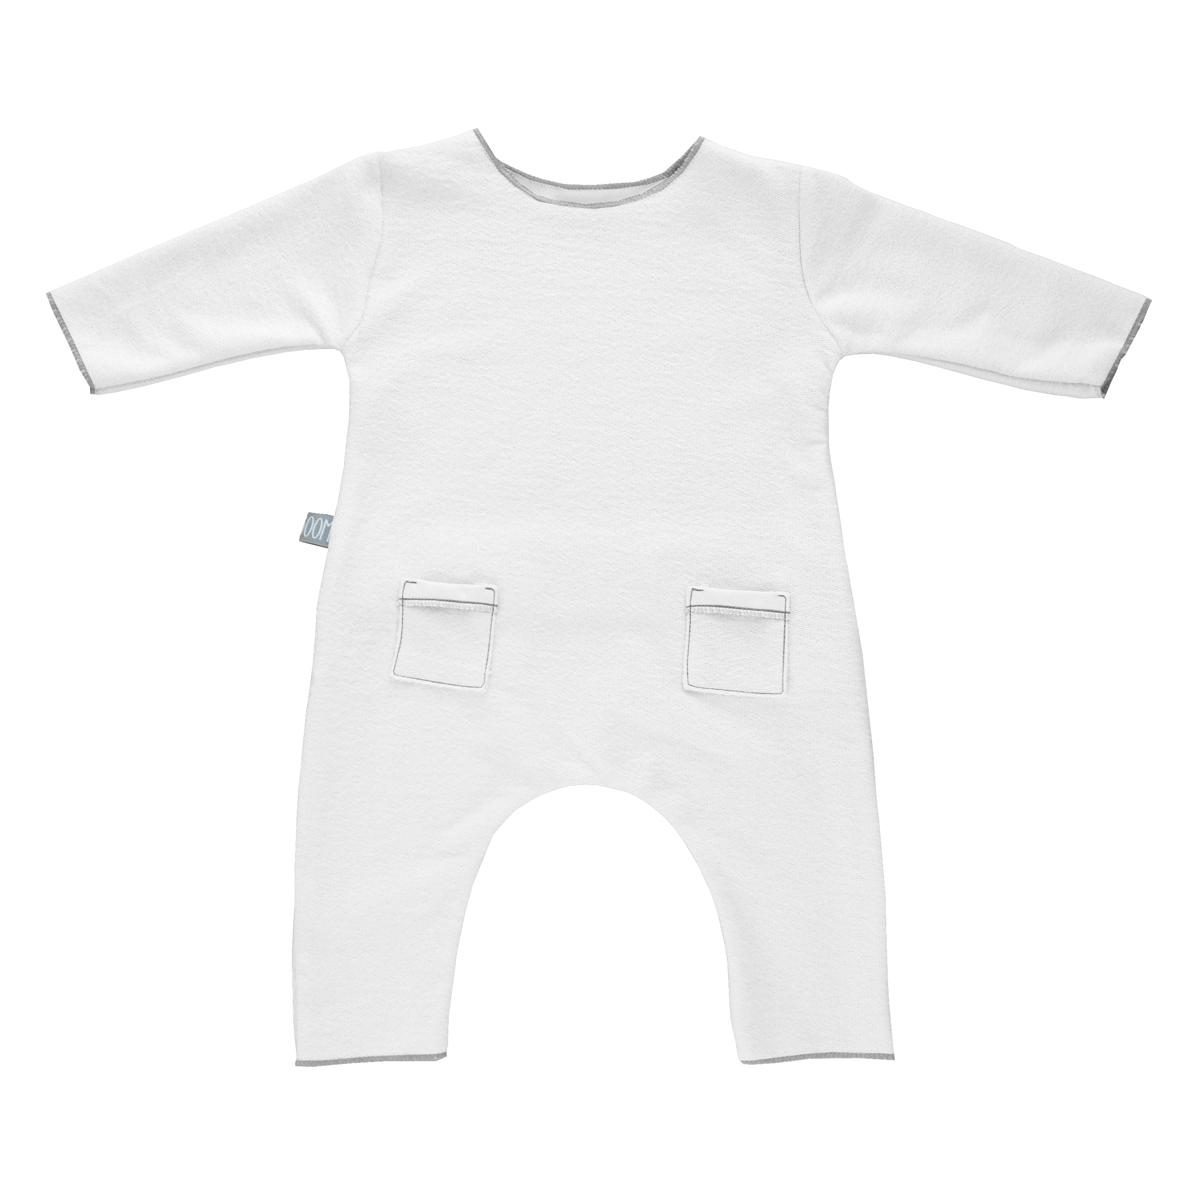 Robe & combinaison Combinaison Blanc - 3 Mois Combinaison Blanc - 3 Mois